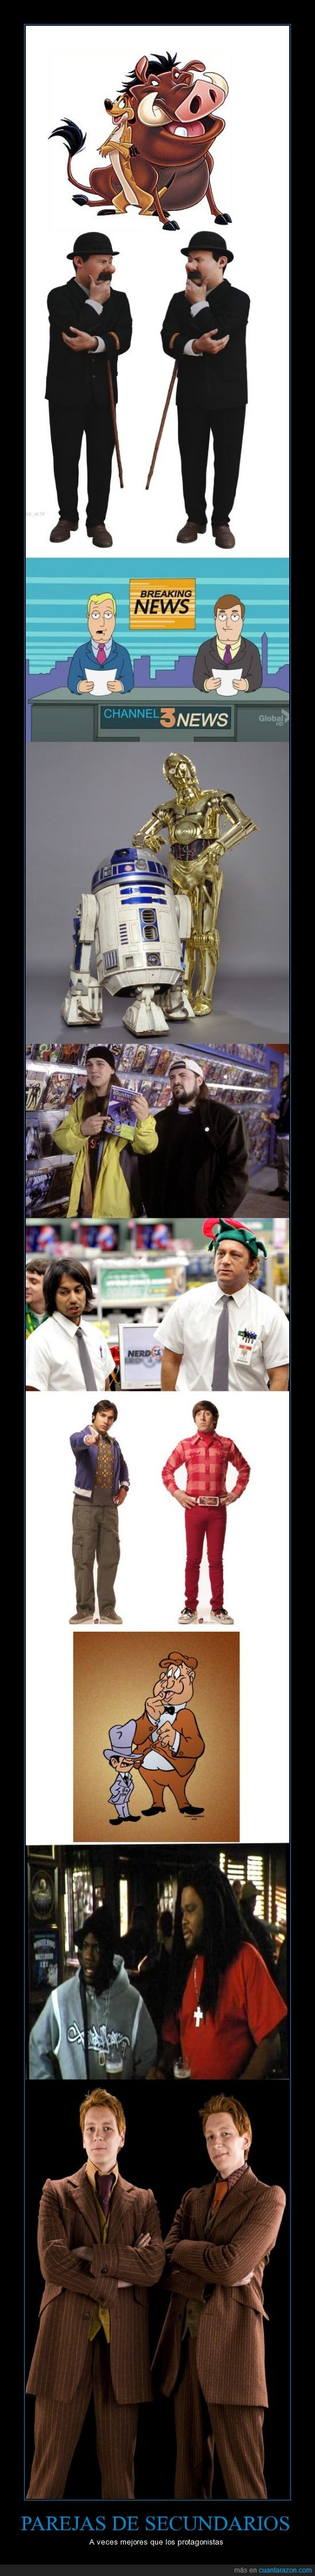 amigos,Big Bang,Chuck,cine,comedia,entrañable,Harry Potter,Parejas,secundarios,Star Wars,televisión,Timón y Pumba,Tintín